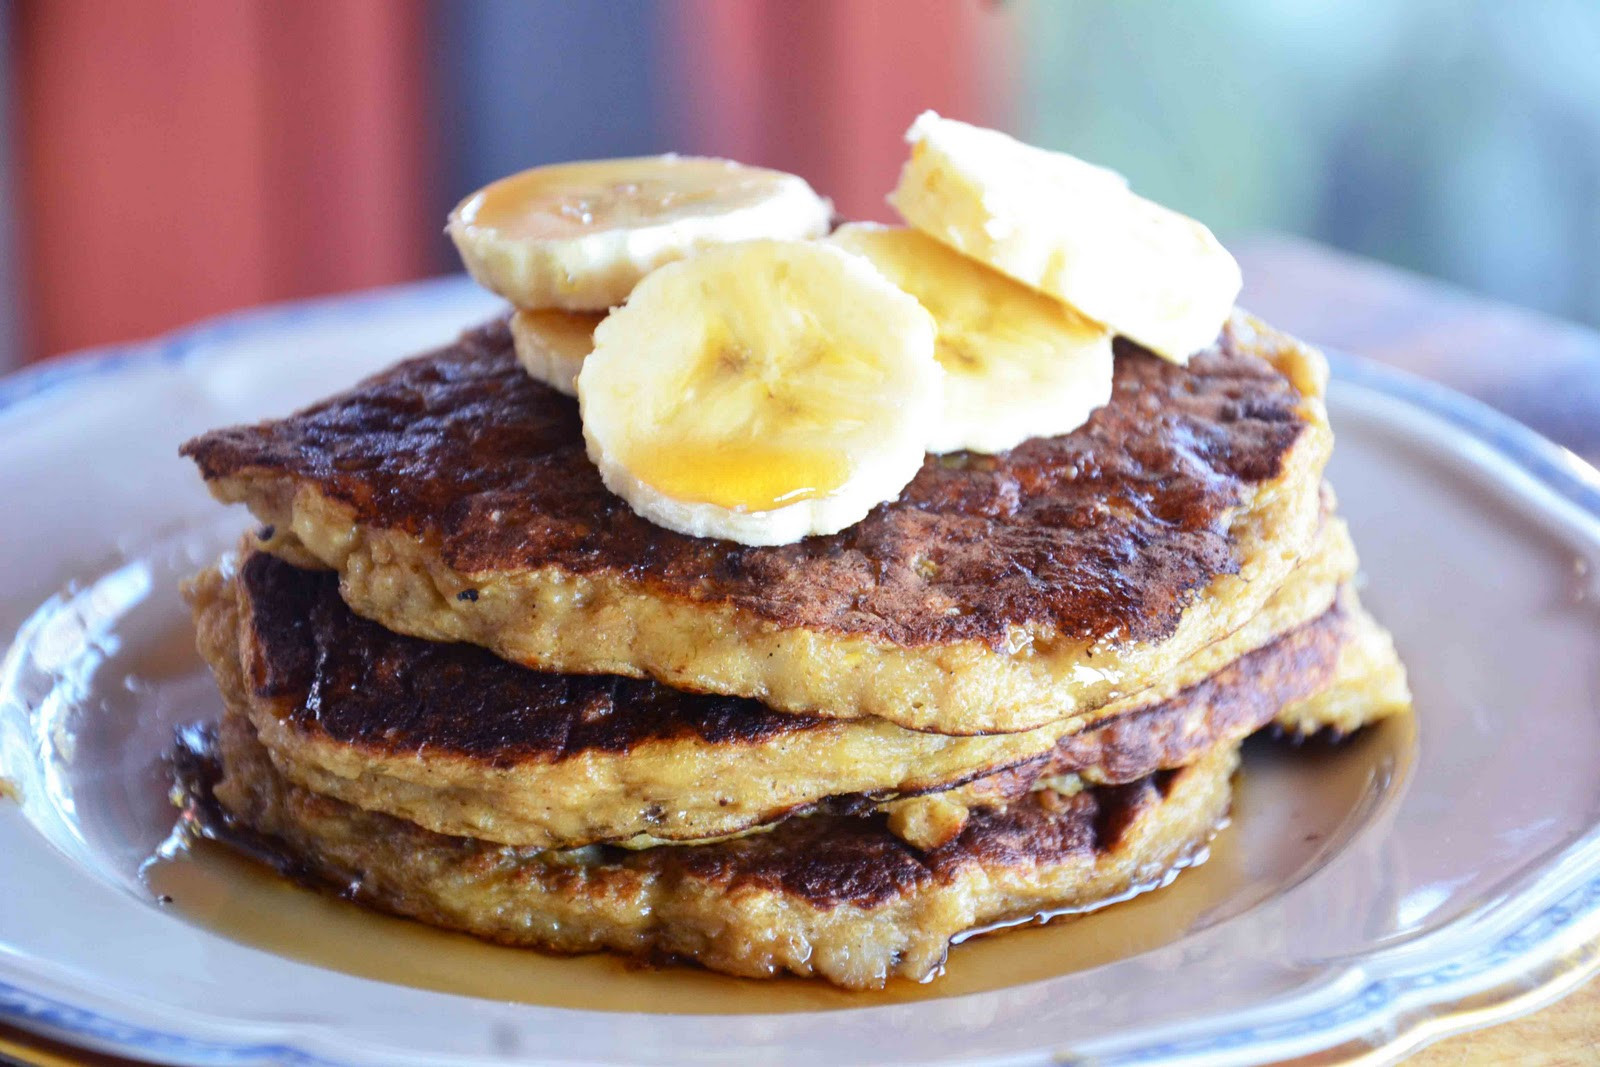 Oatmeal Banana Pancakes  The eccentric Cook Oatmeal Pancakes Oatmeal Banana Cake